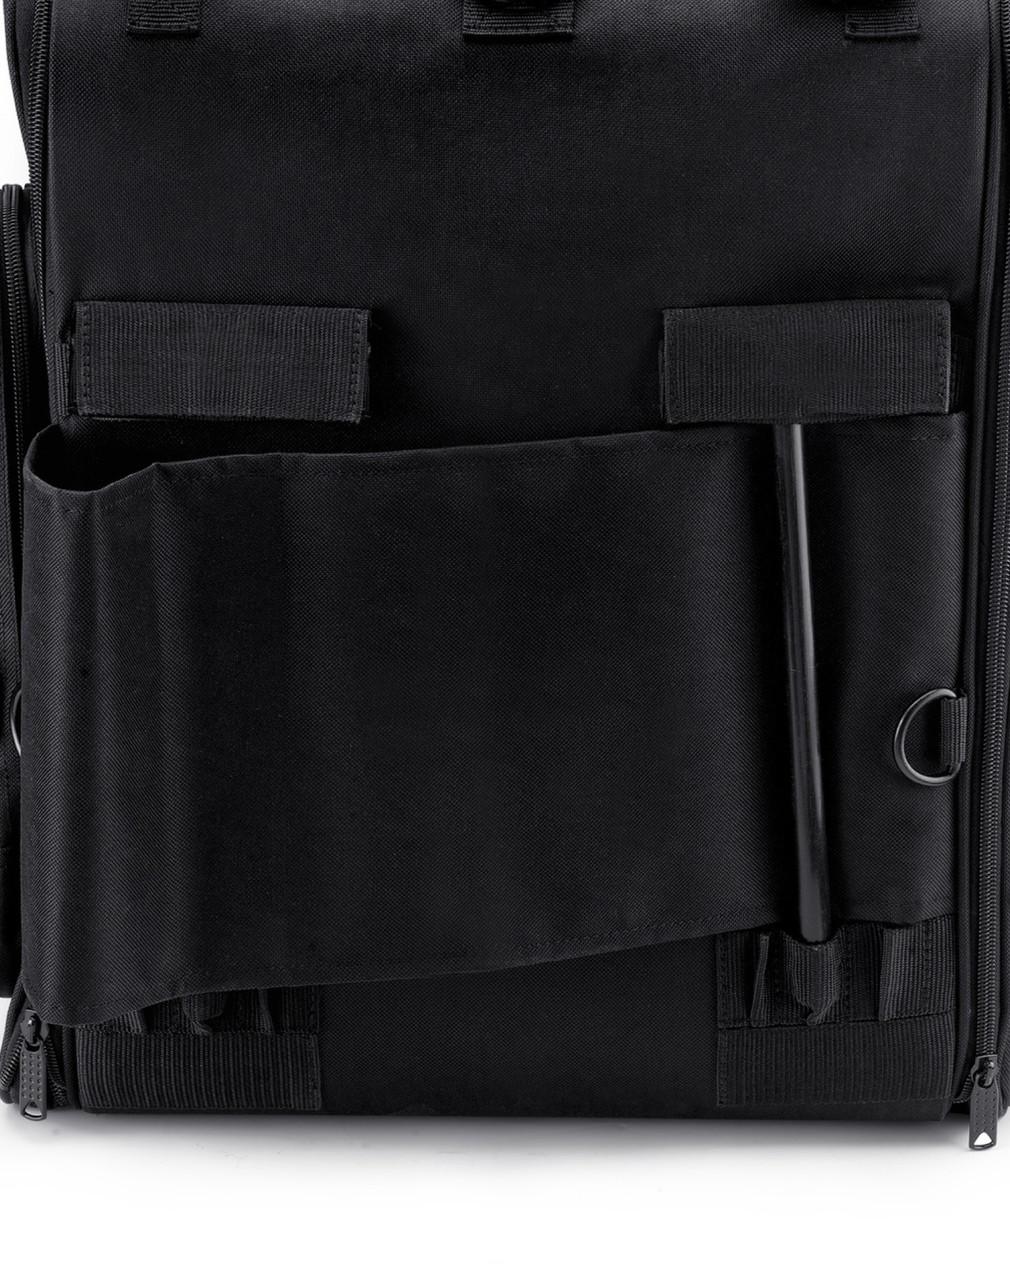 Harley Davidson Viking Extra Large Plain Motorcycle Tail Bag Back Side View